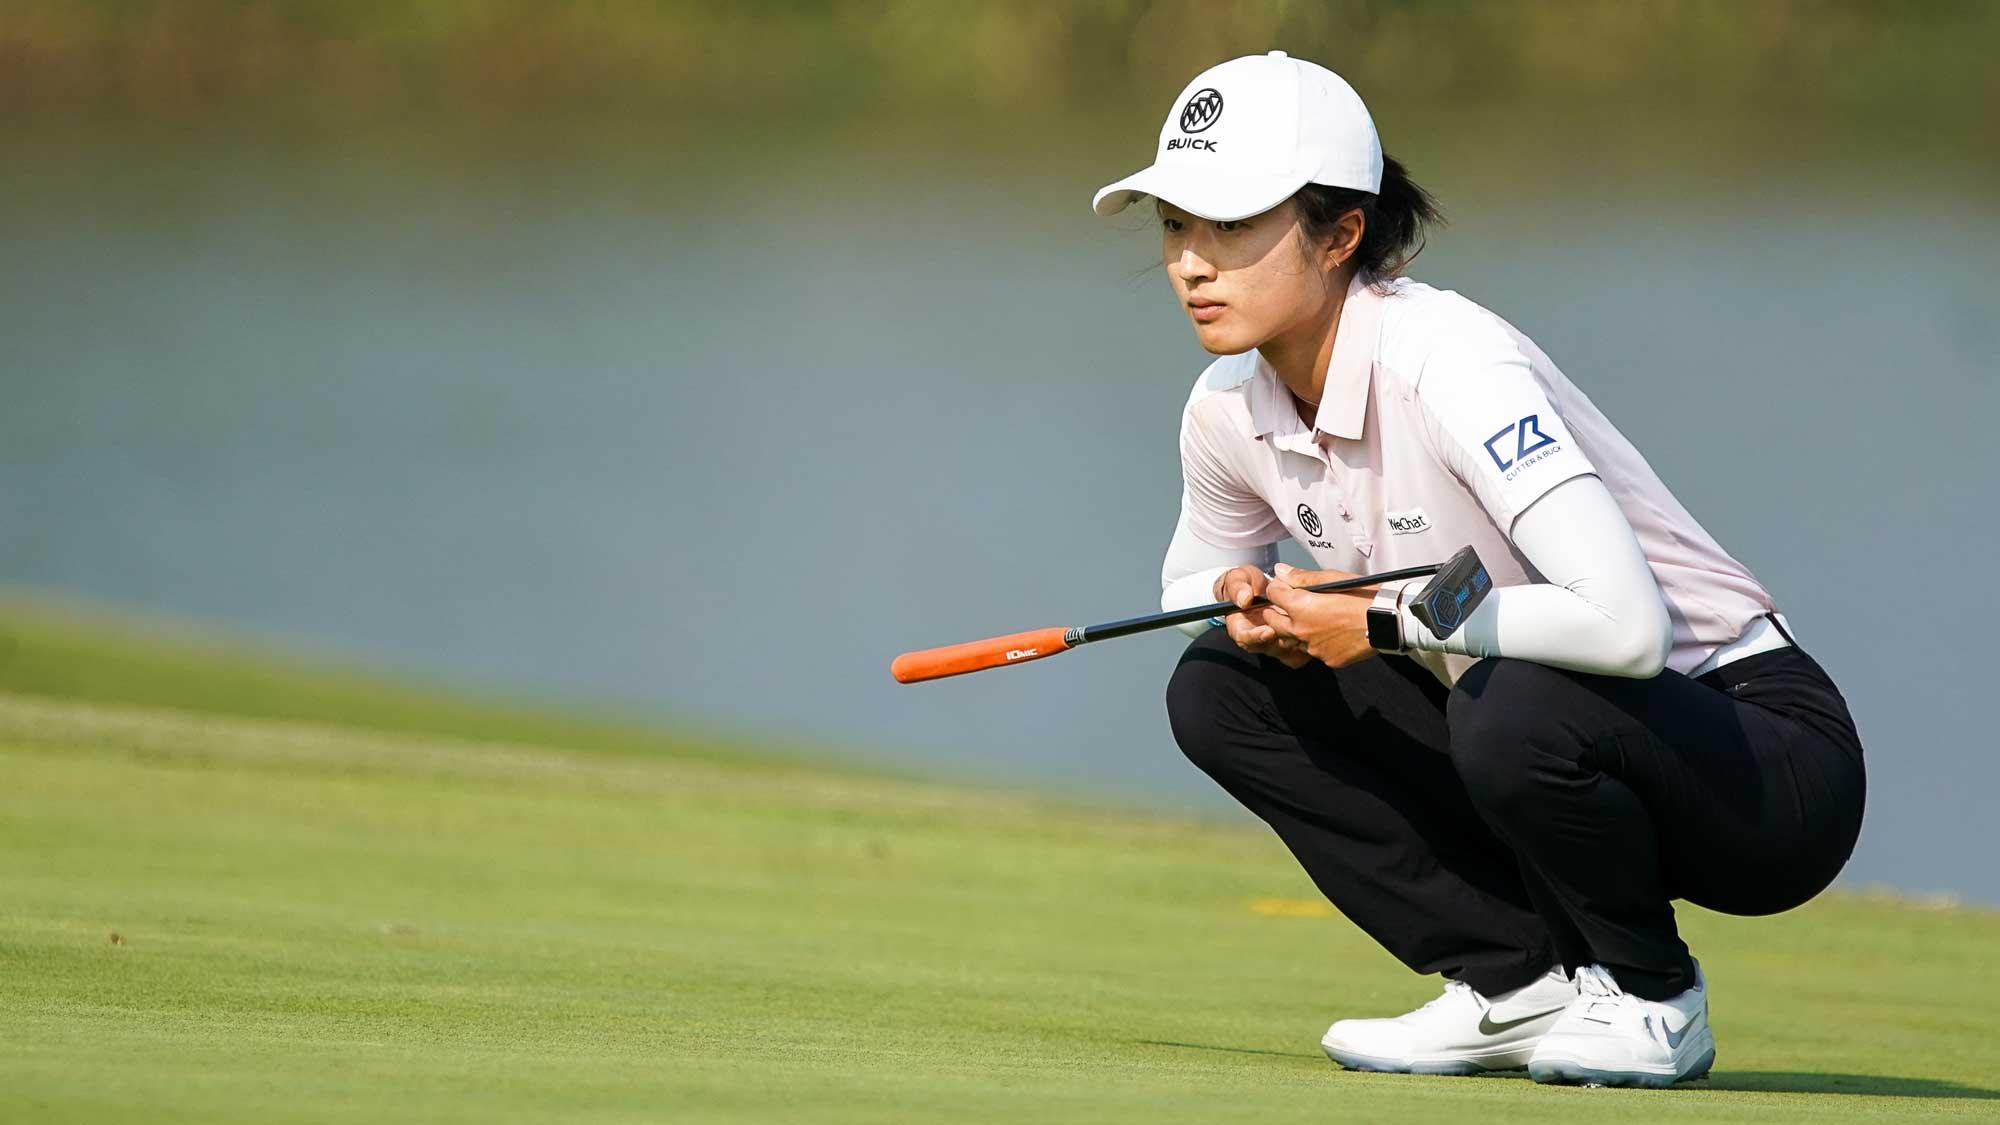 2019 Buick LPGA Shanghai Final Round Notes   LPGA   Ladies Professional Golf Association